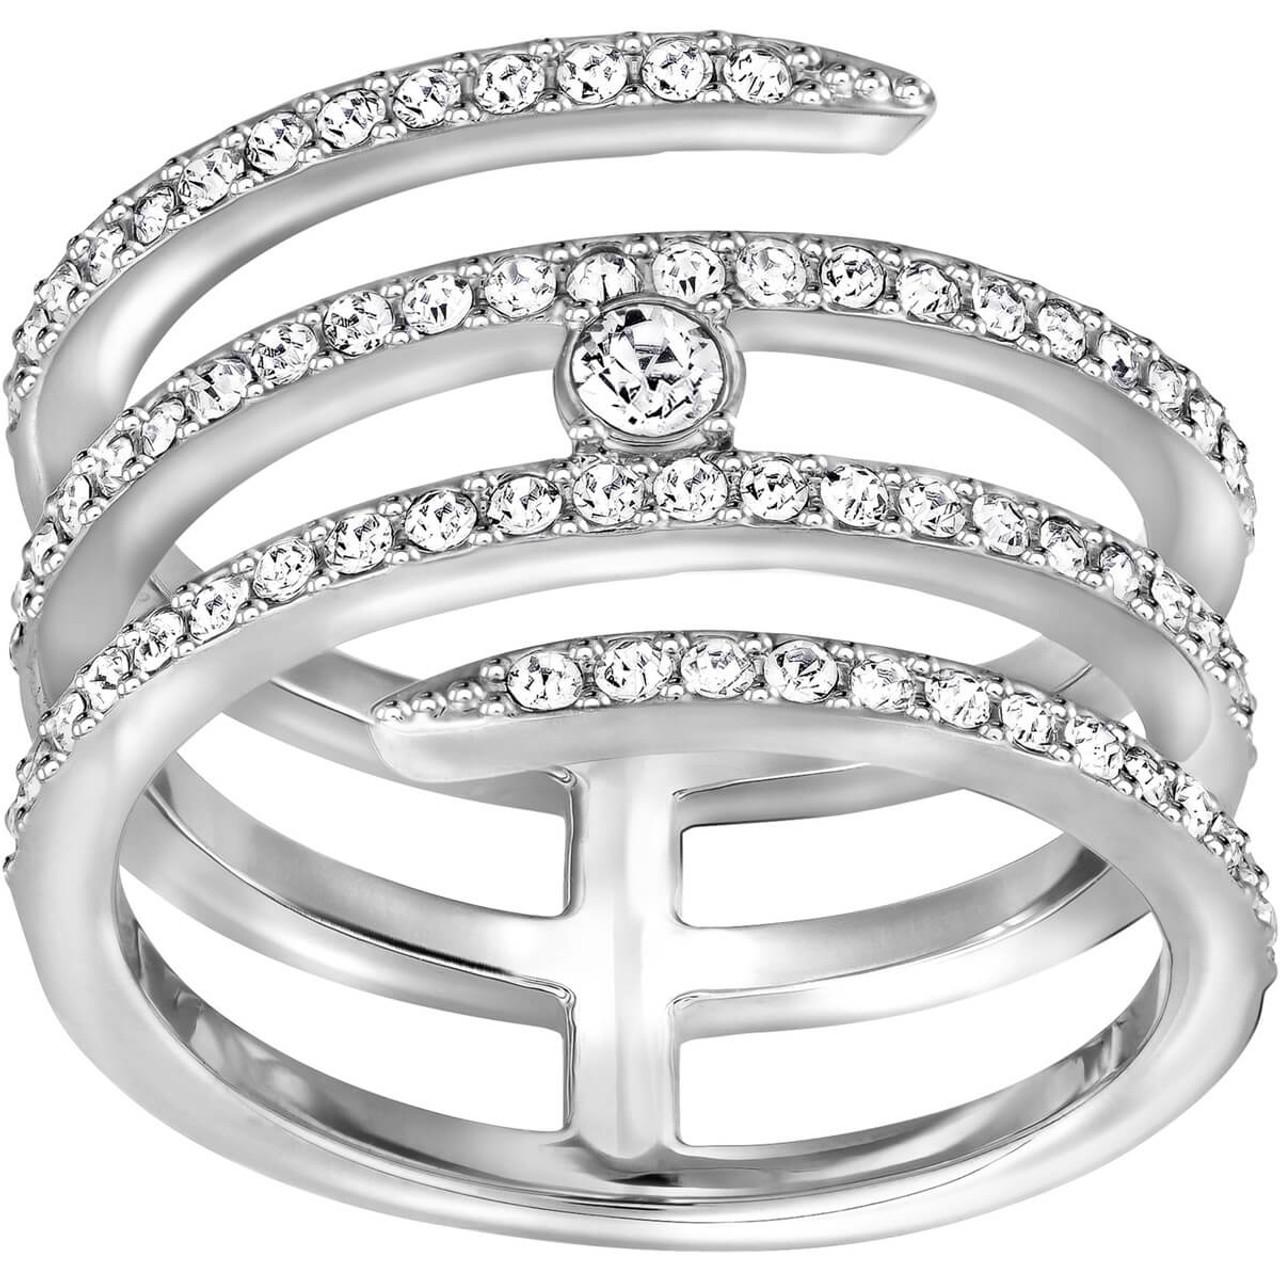 Swarovski Creativity Coiled Silver Ring